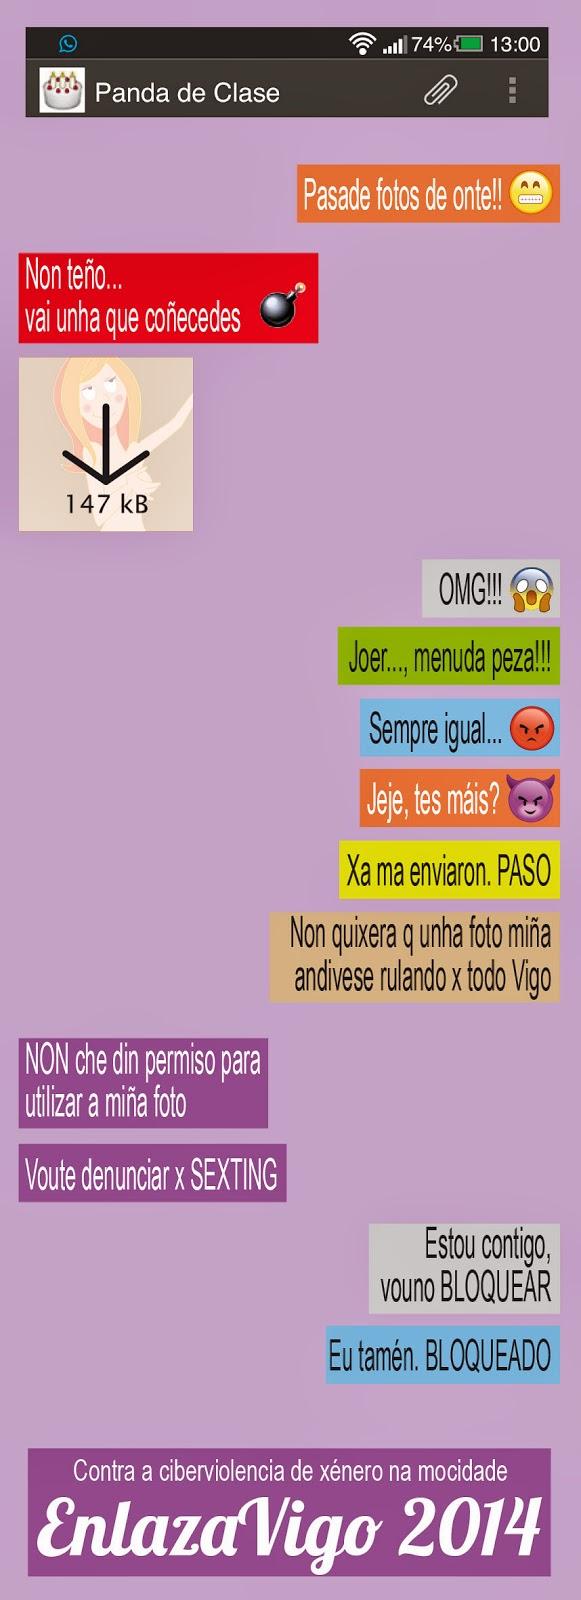 tapiz-whatsapp-def